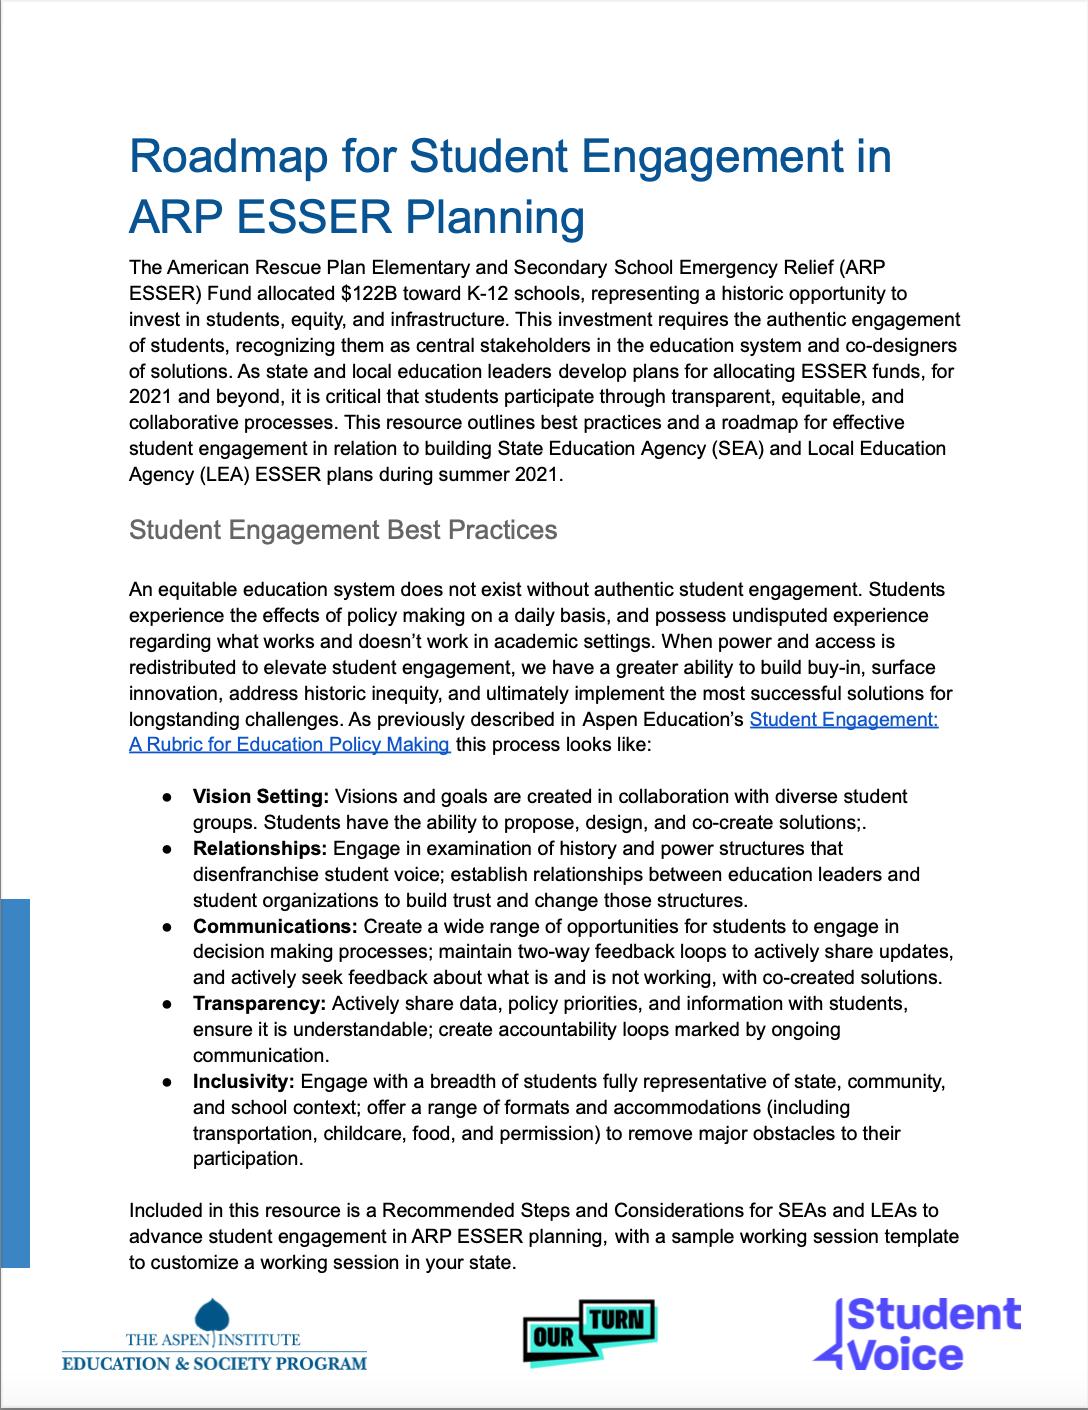 Roadmap for Student Engagement in ARP ESSER Planning